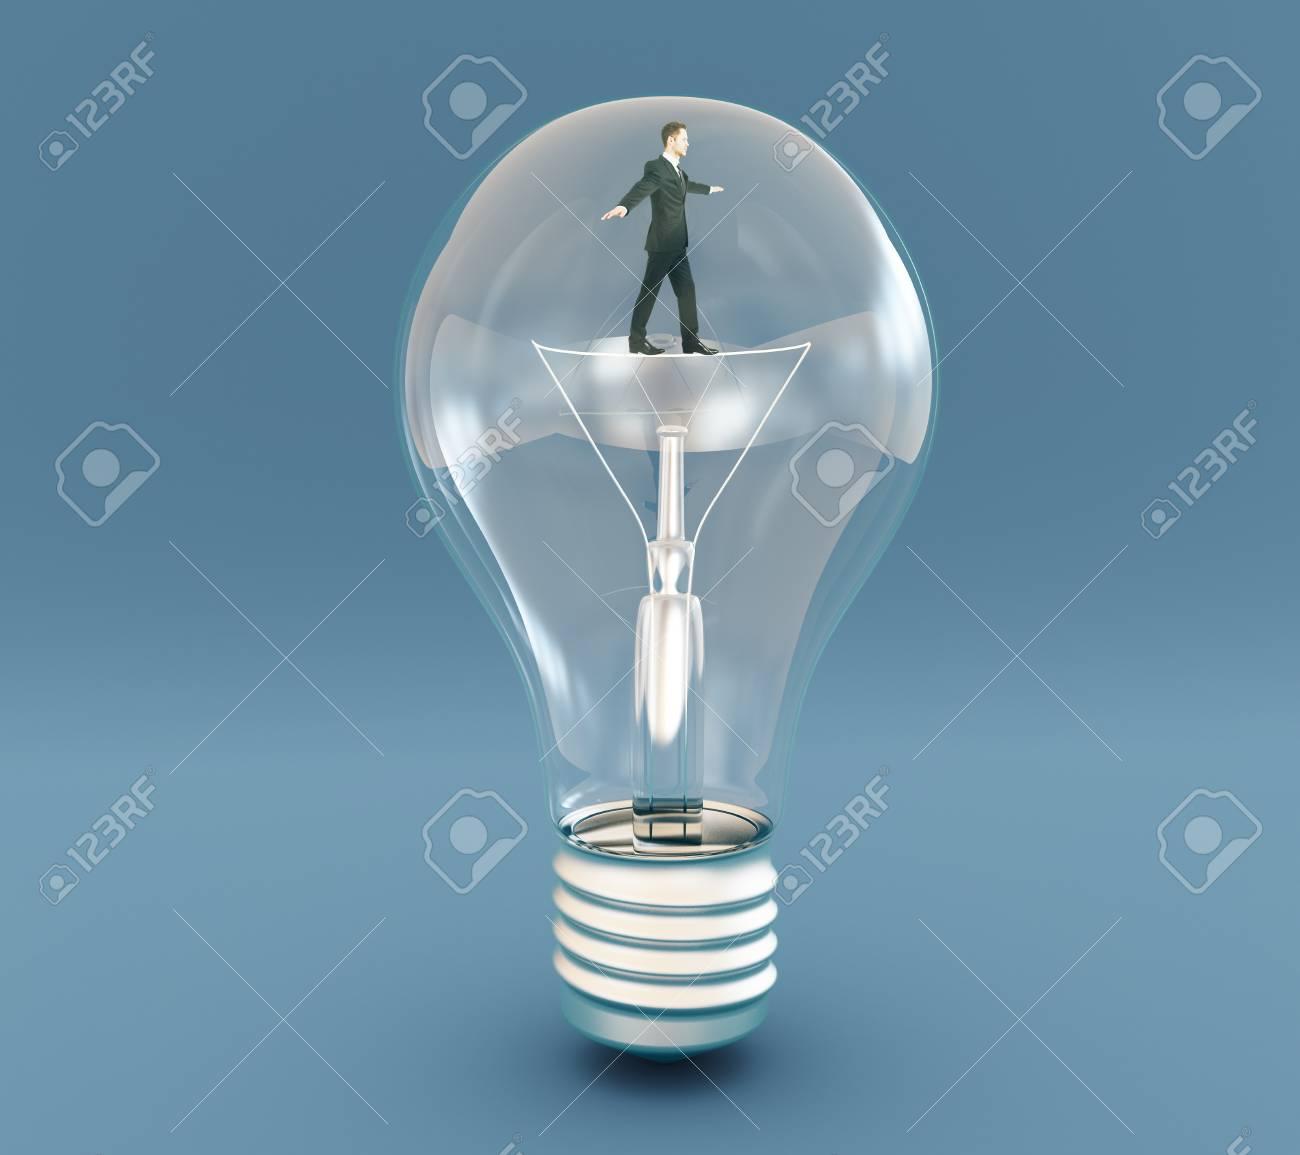 idea concept with businessman